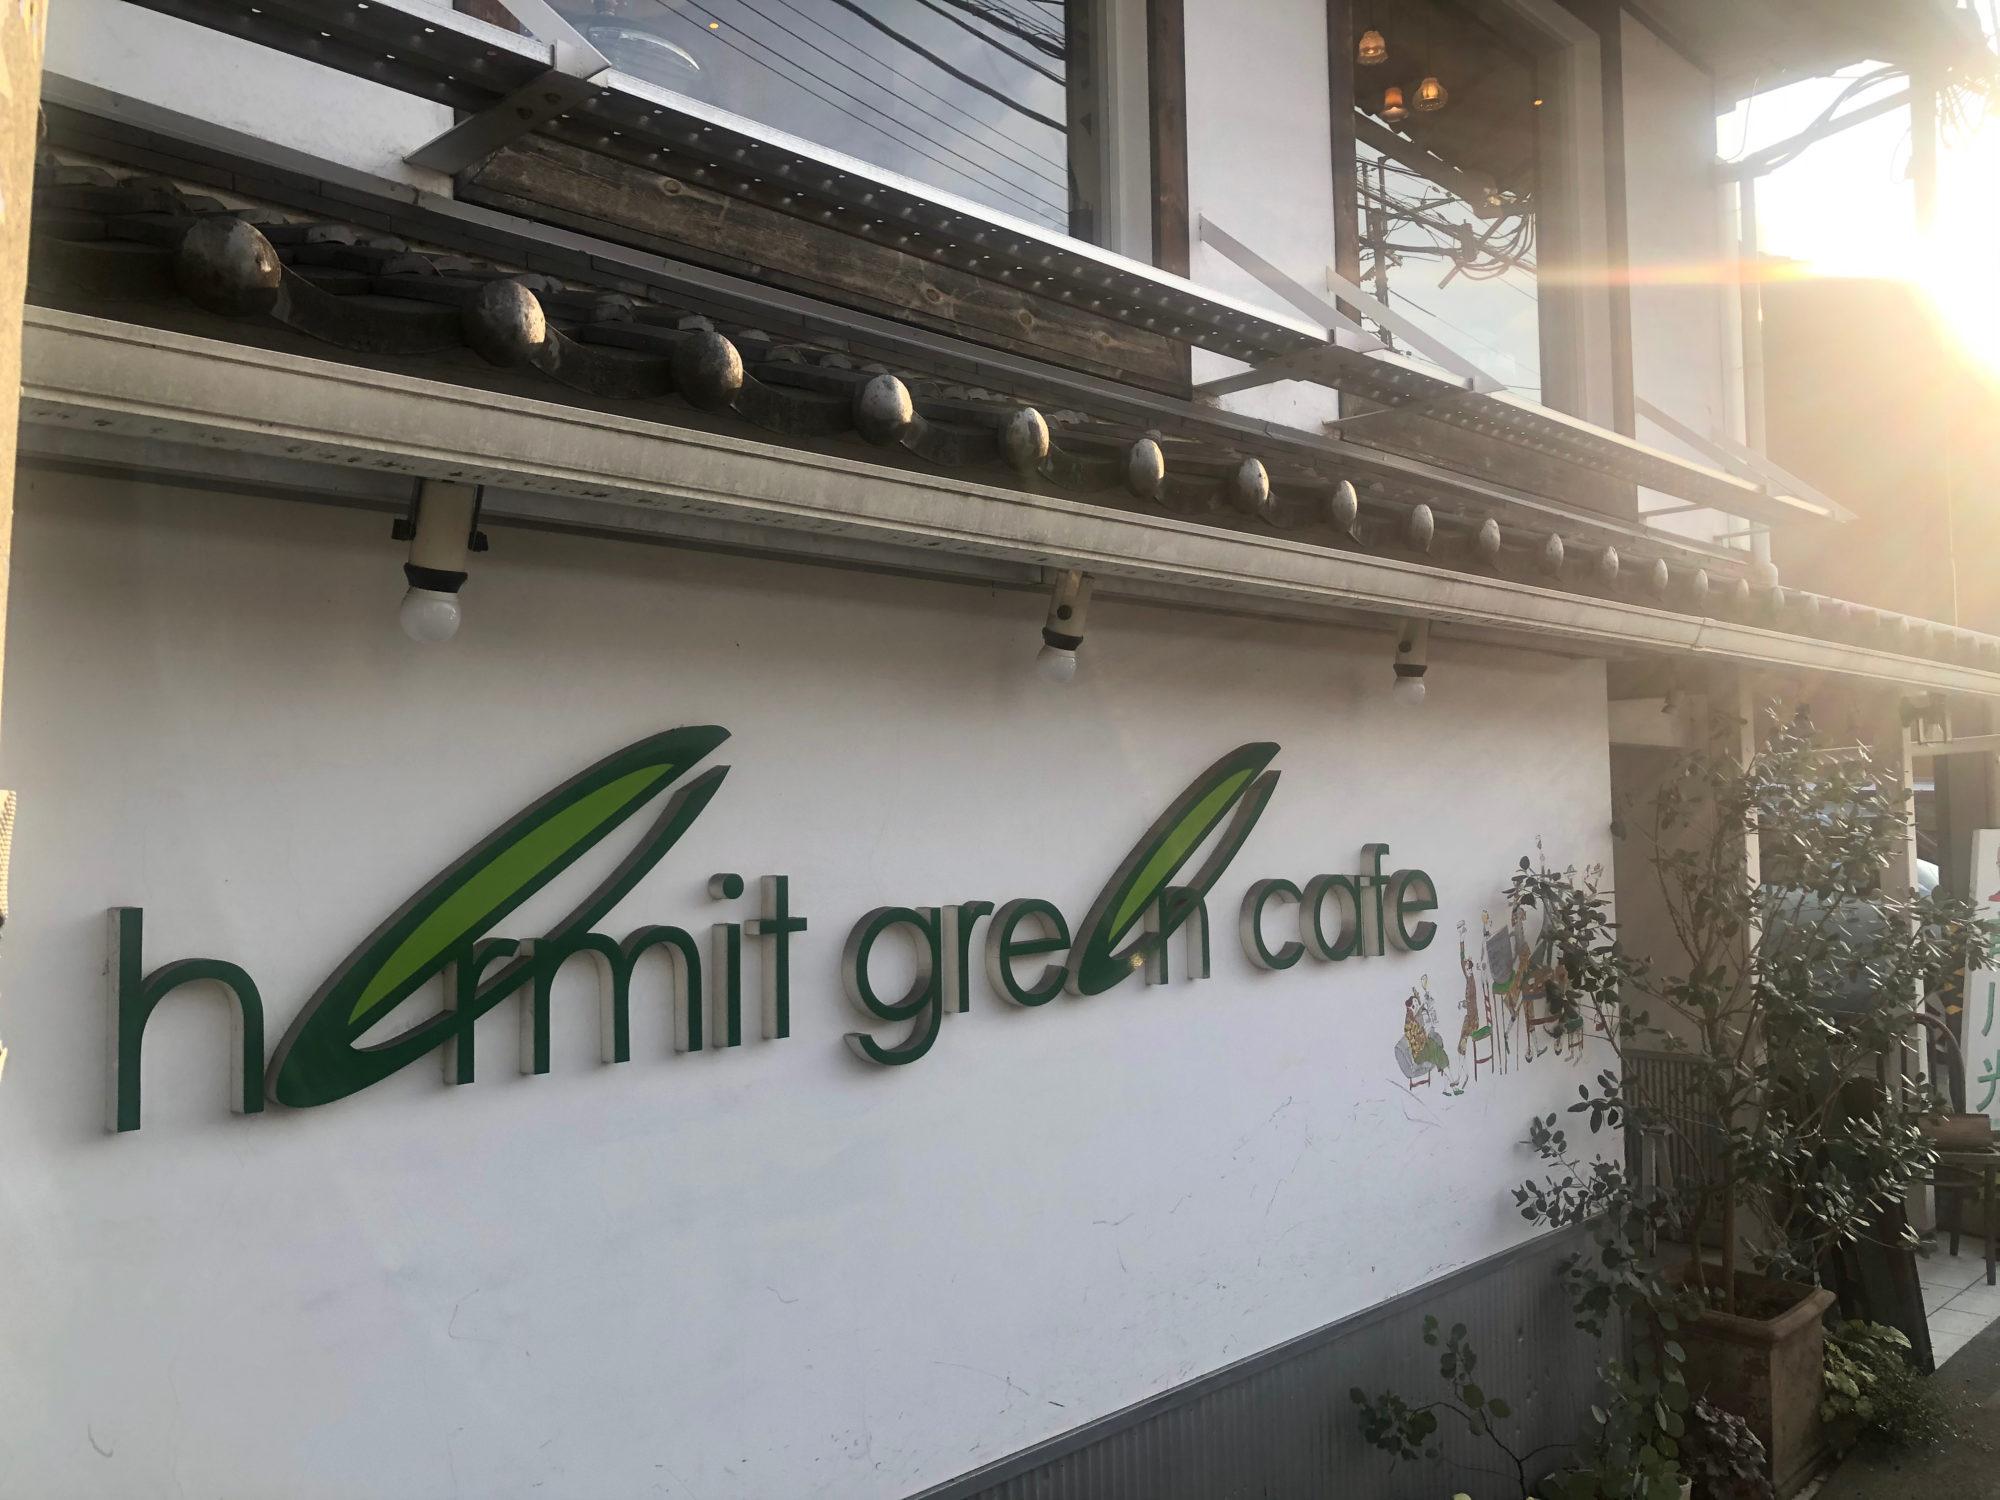 Hermit green cafe 大山崎店~山崎ウィスキーの工場見学の後に楽しむおしゃれランチ~